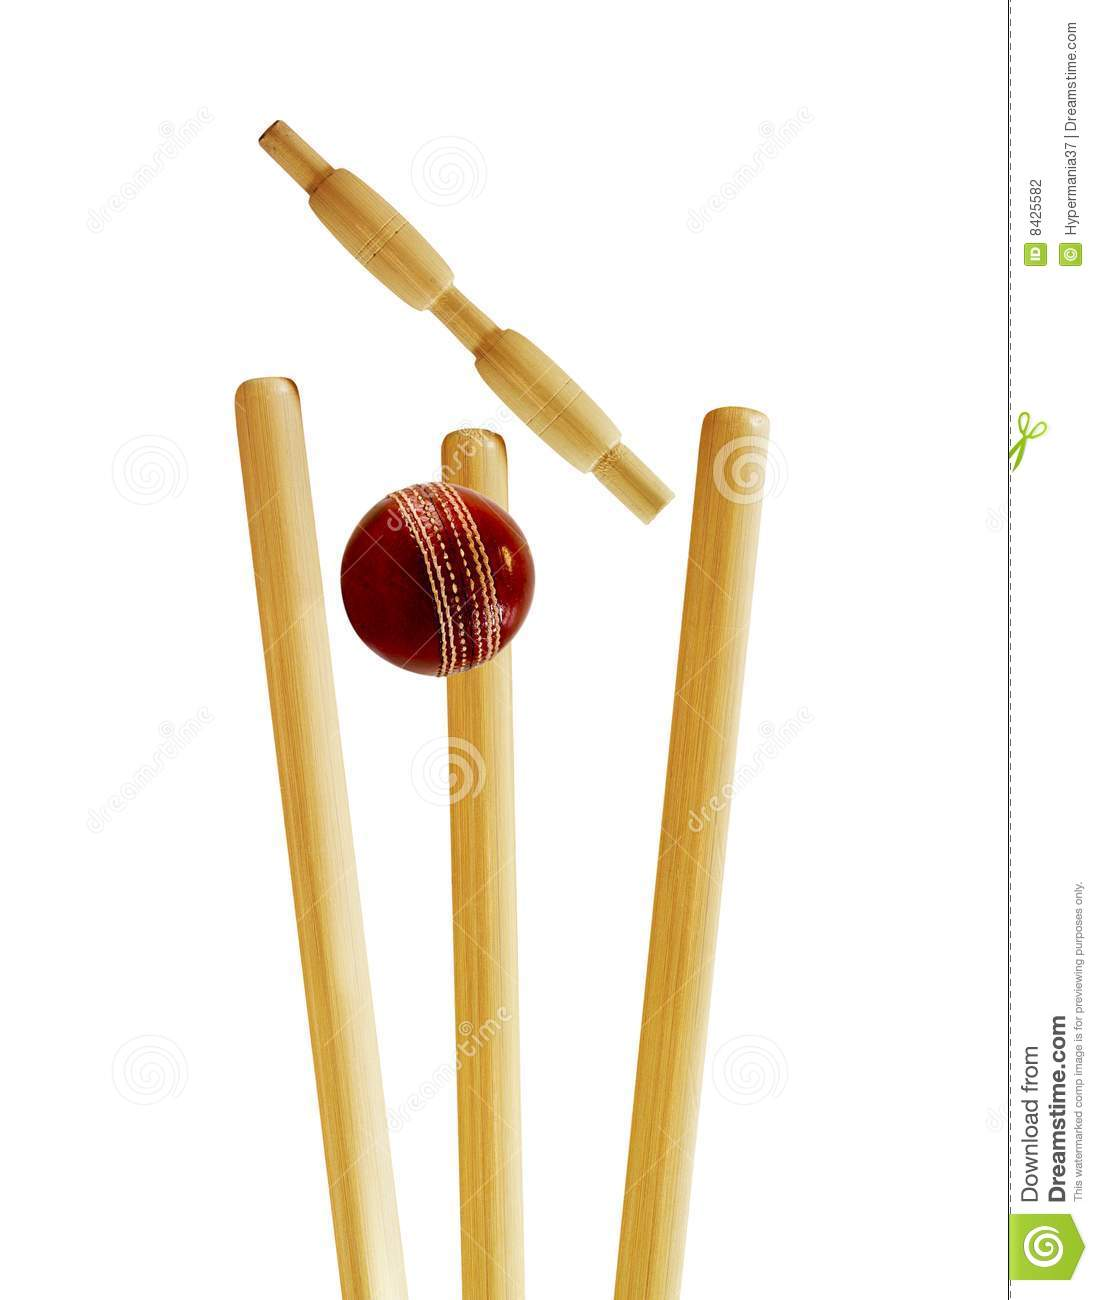 Cricket wicket clipart.